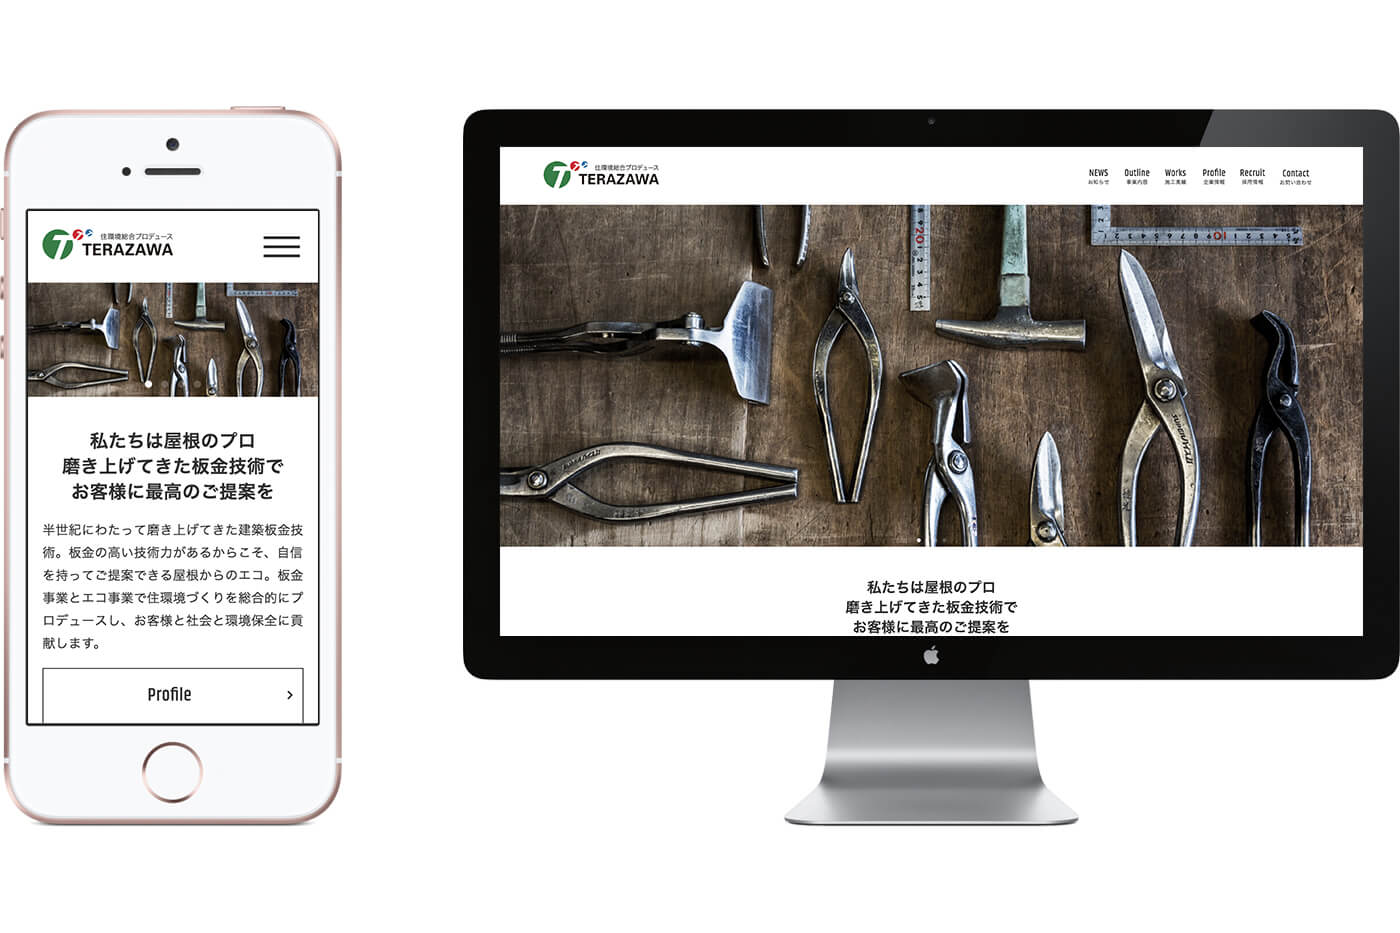 TERAZAWA[建築板金]ホームページ制作